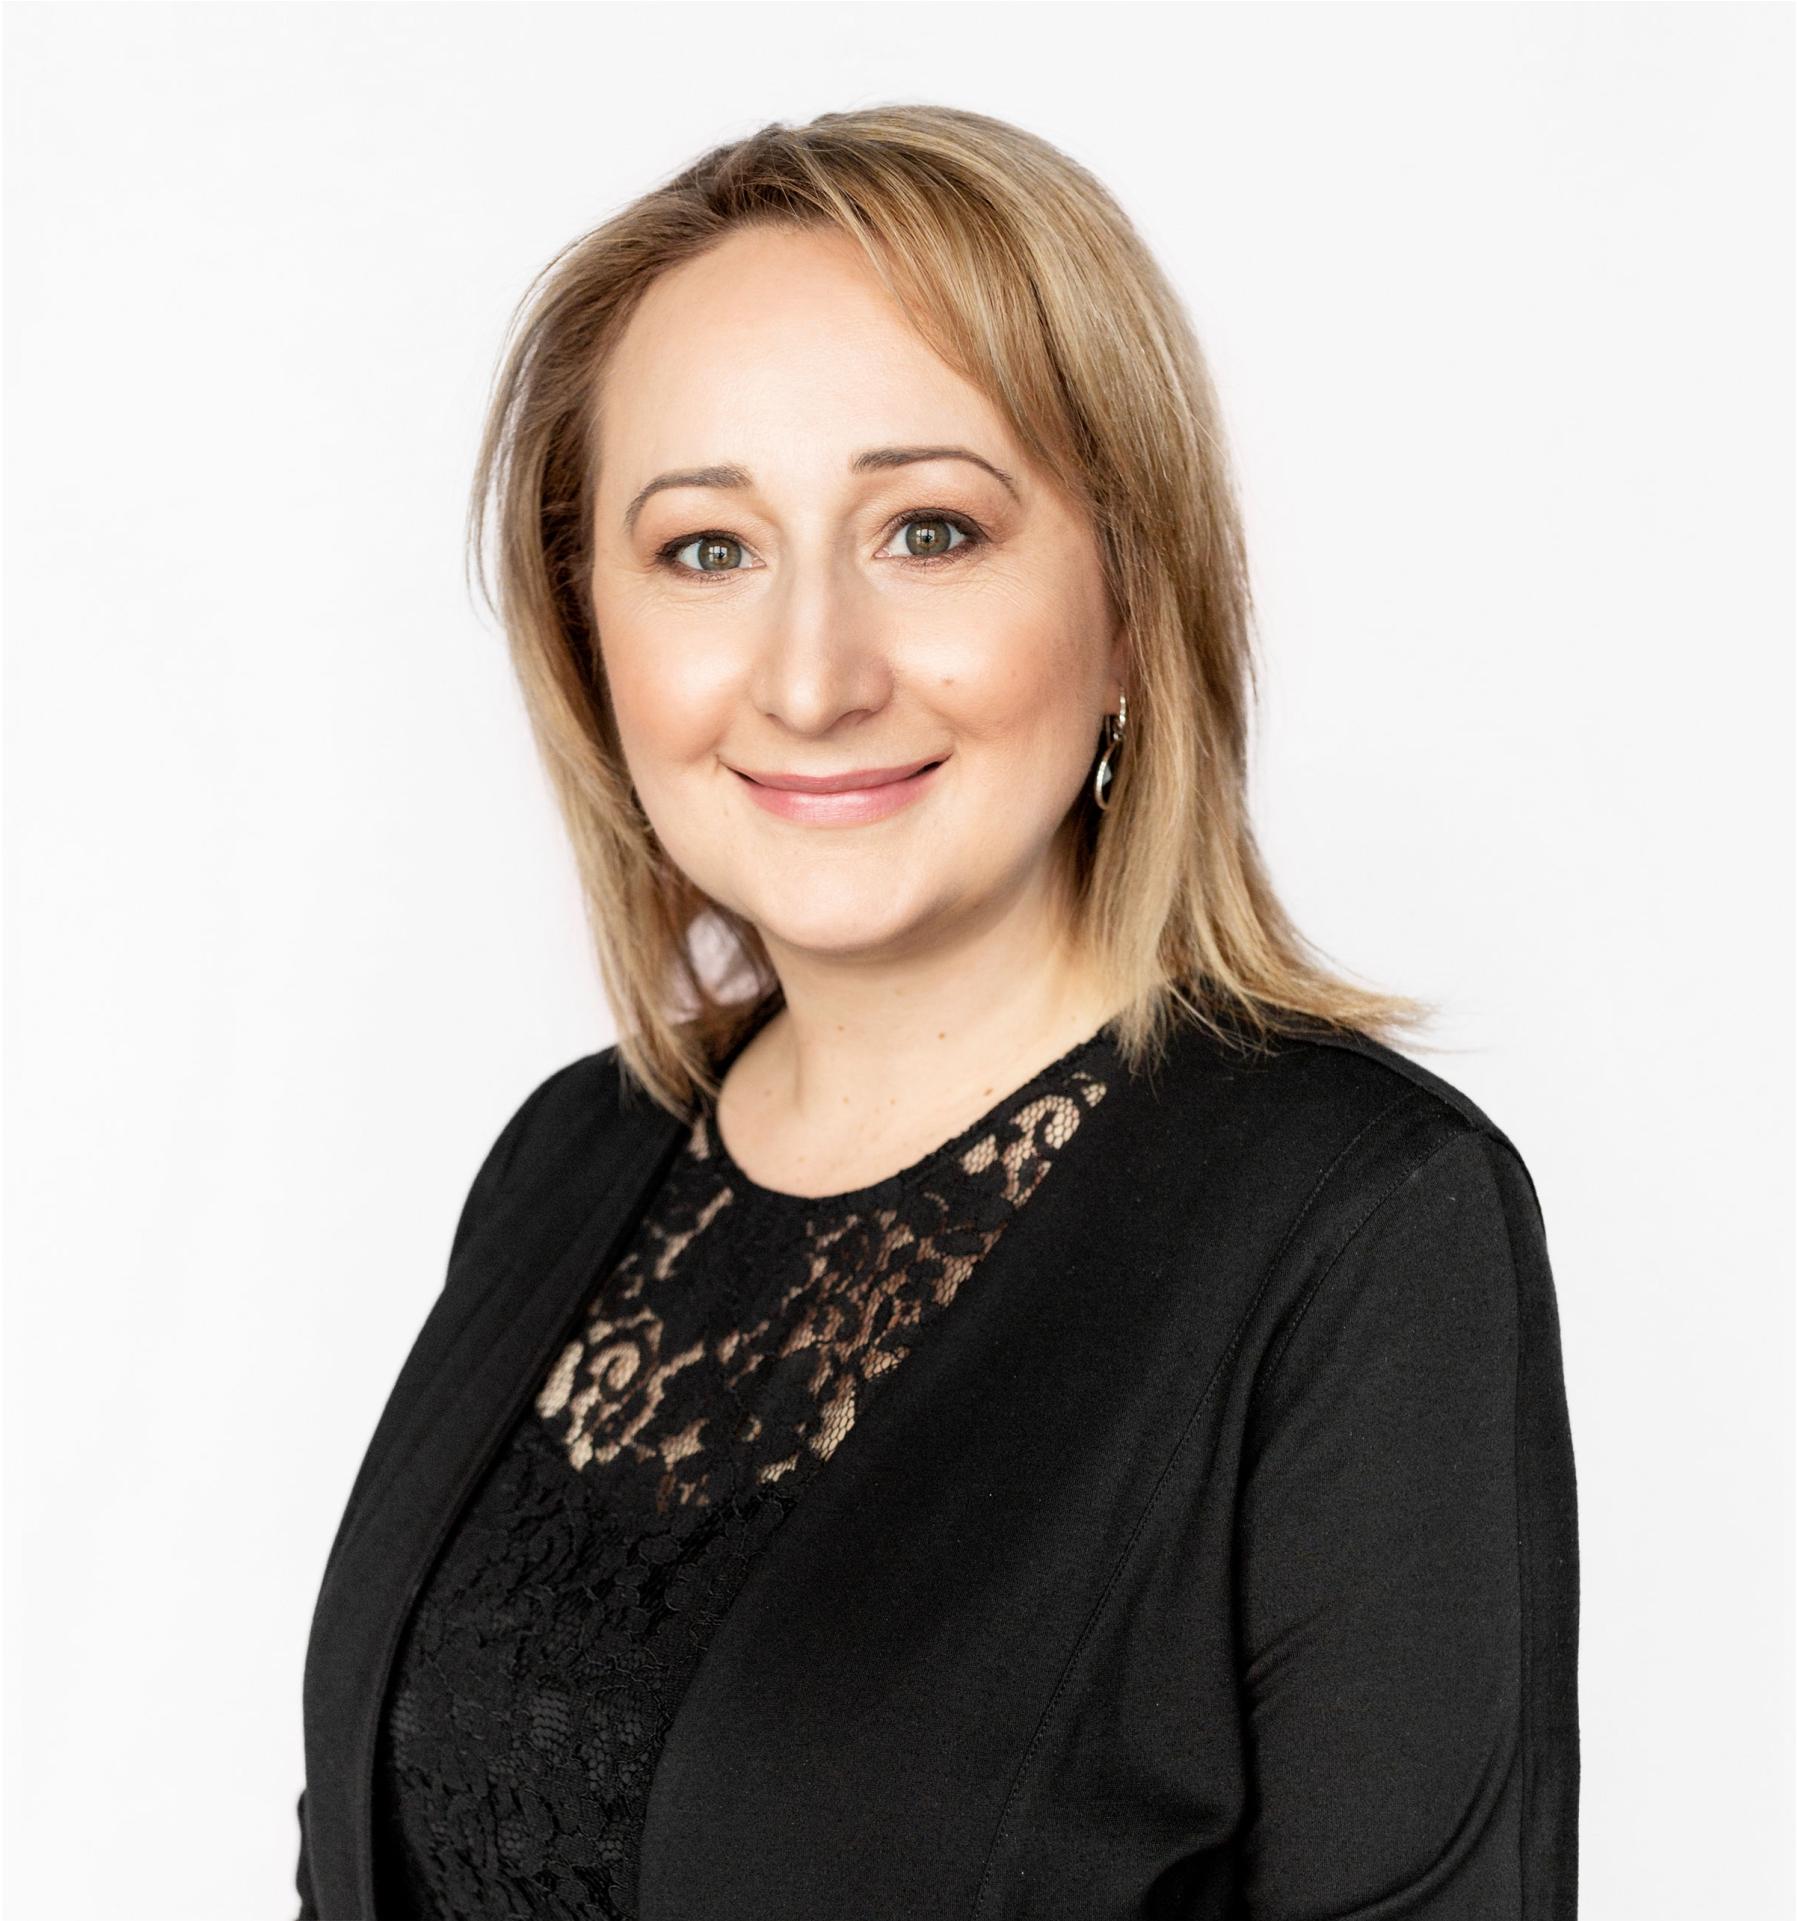 Christina L. Tchir